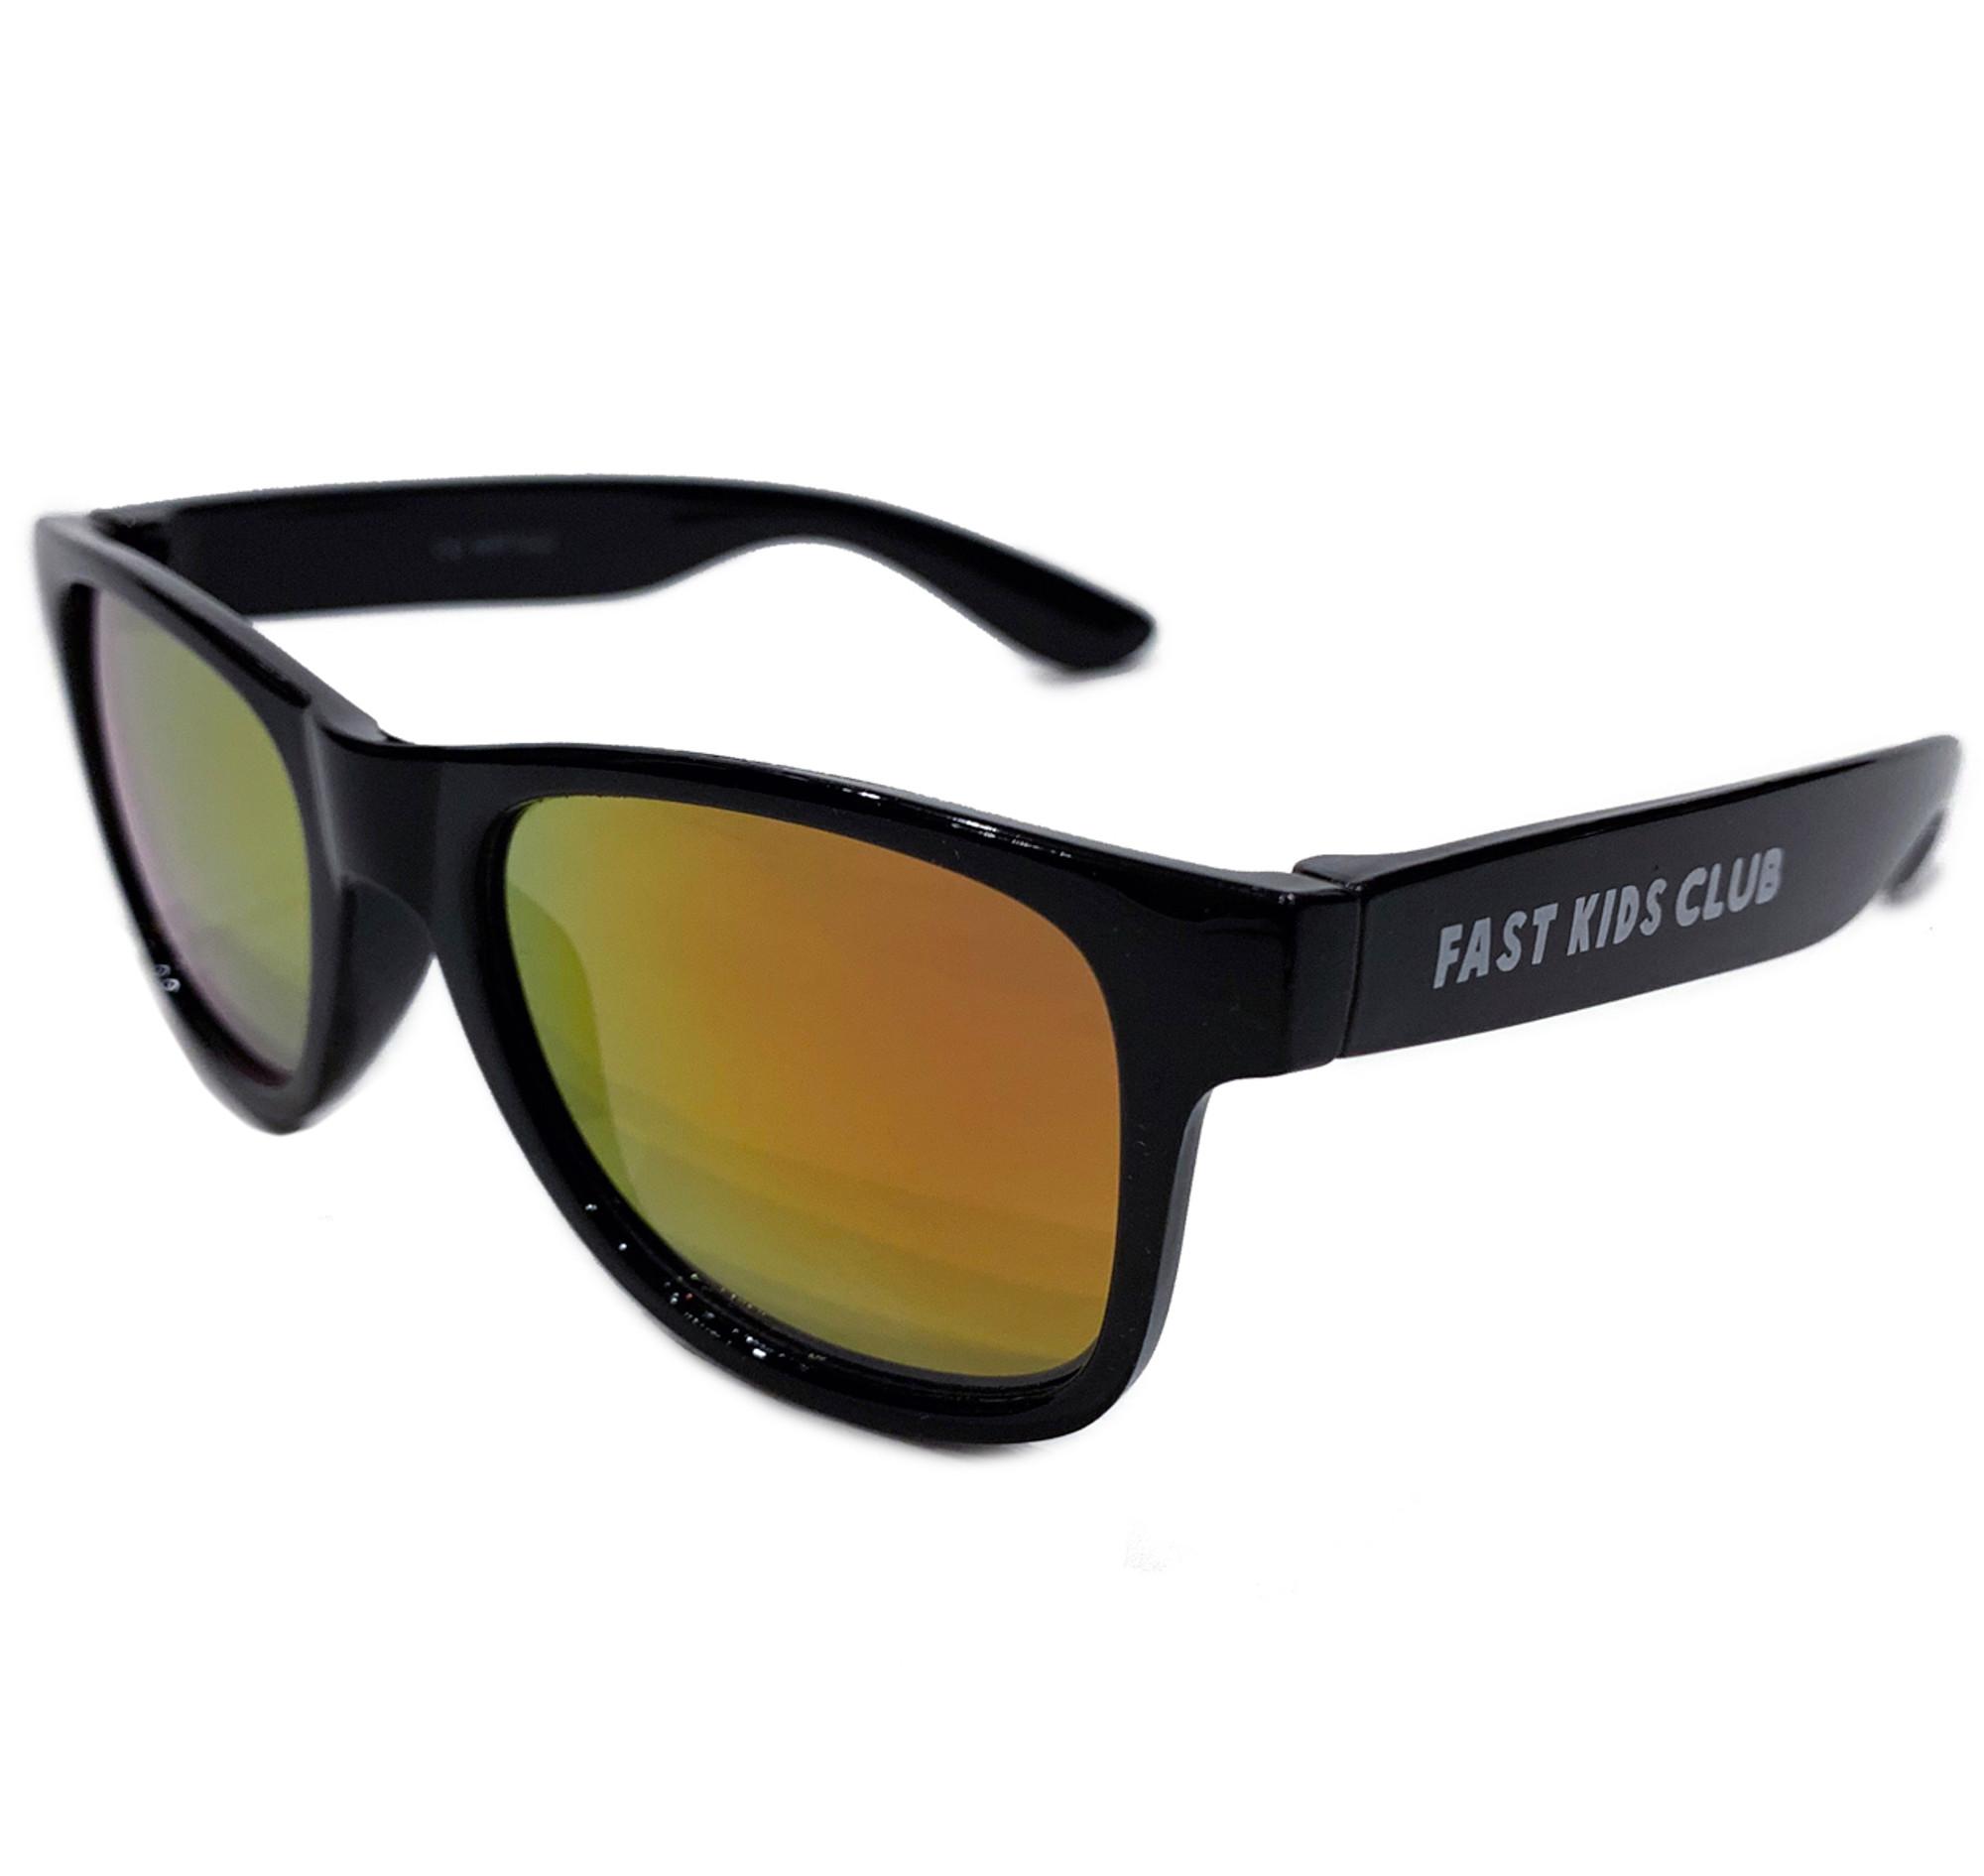 6b878067a1 FKC Kids Sunglasses